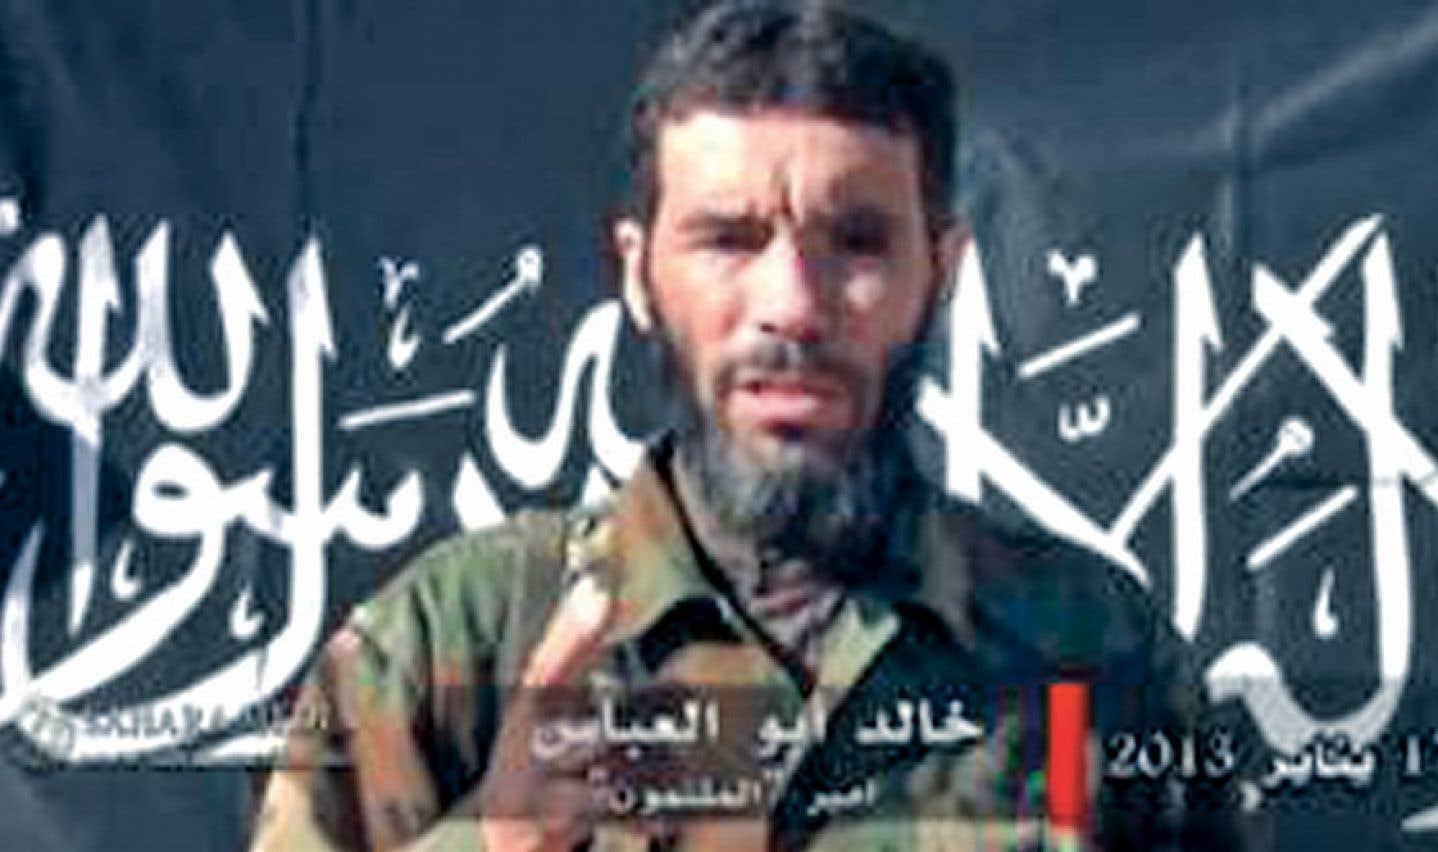 Prise d'otages à In Amenas: un lourd bilan humain